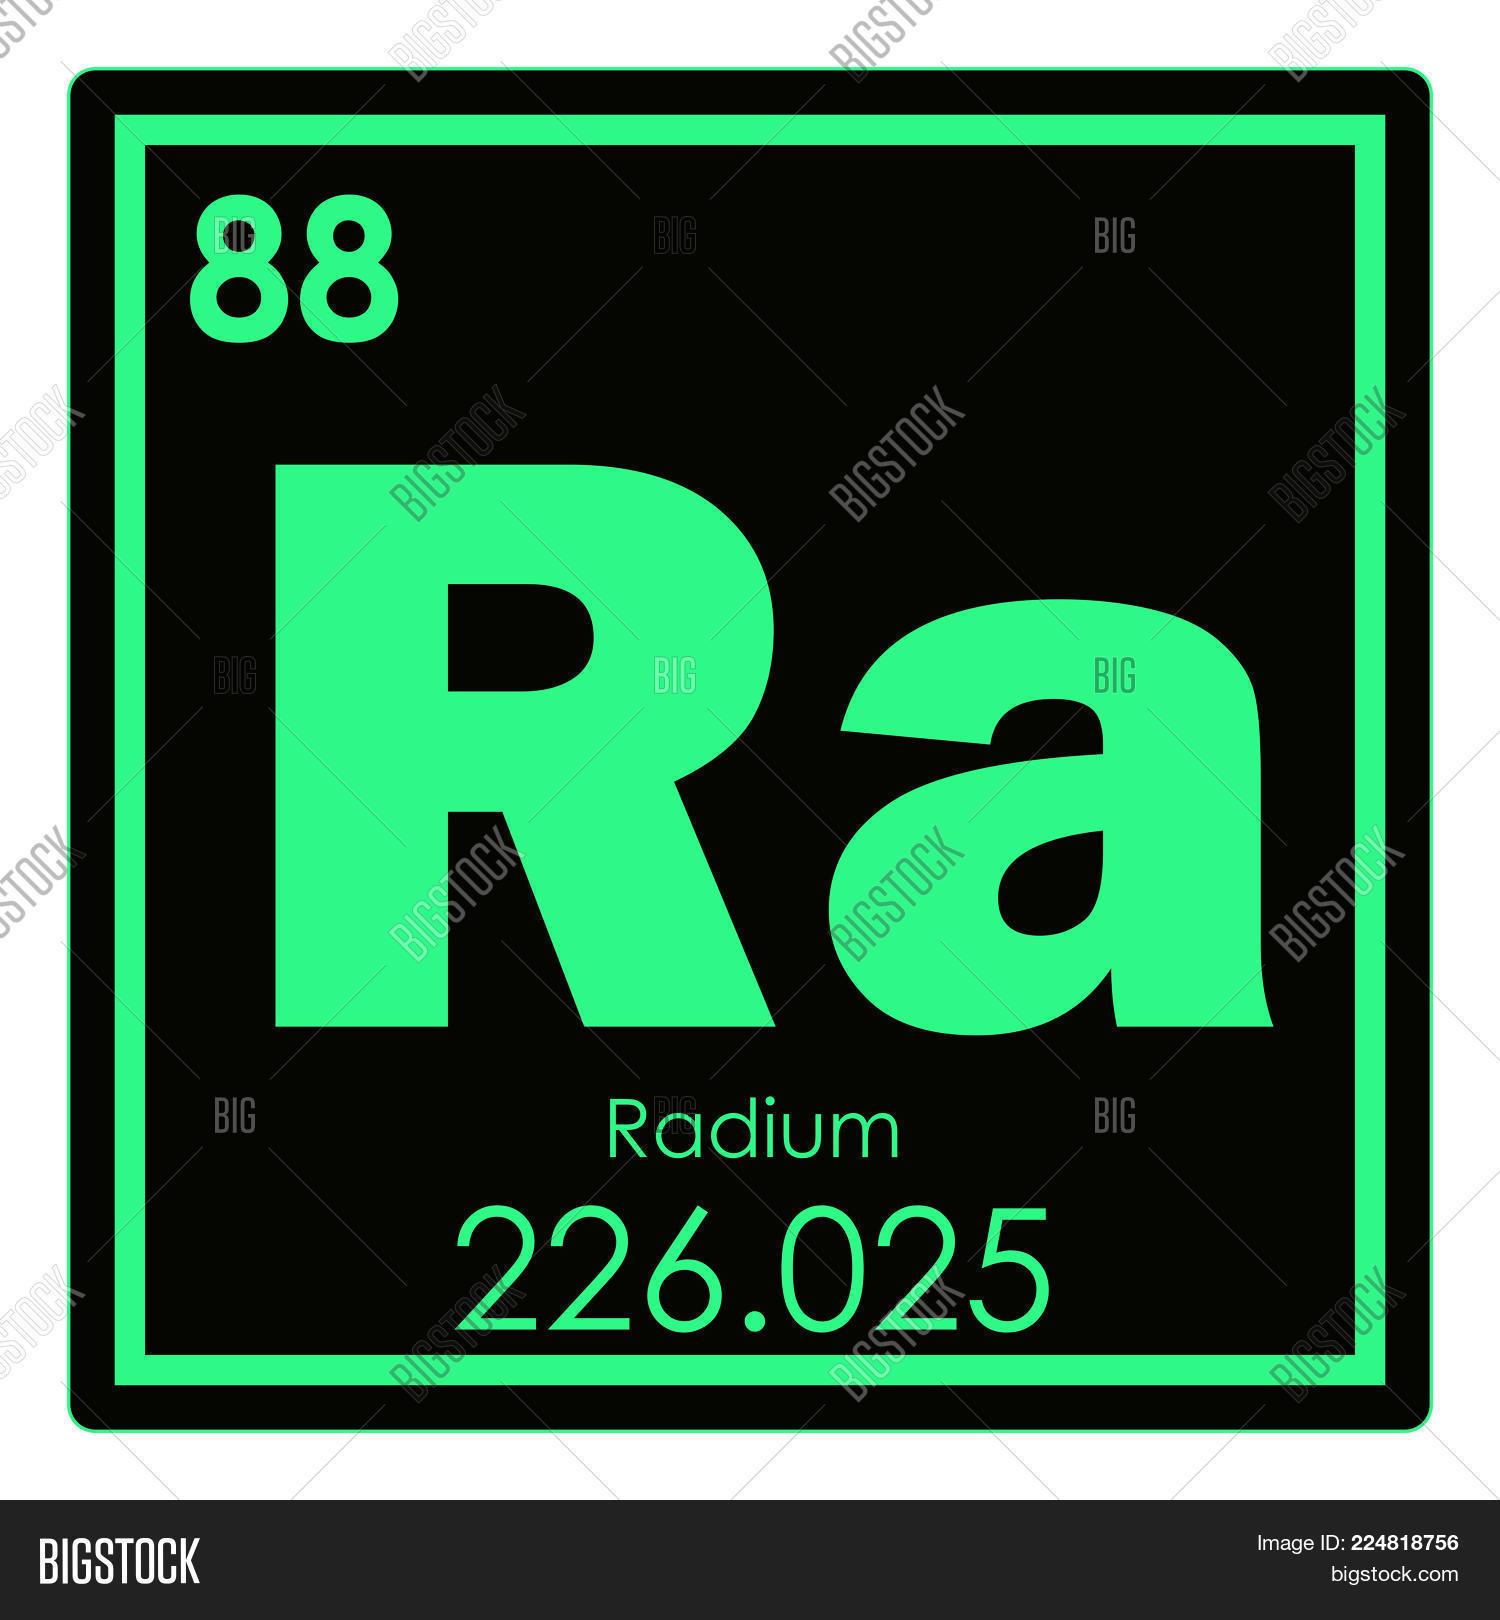 Radium Chemical Image Photo Free Trial Bigstock